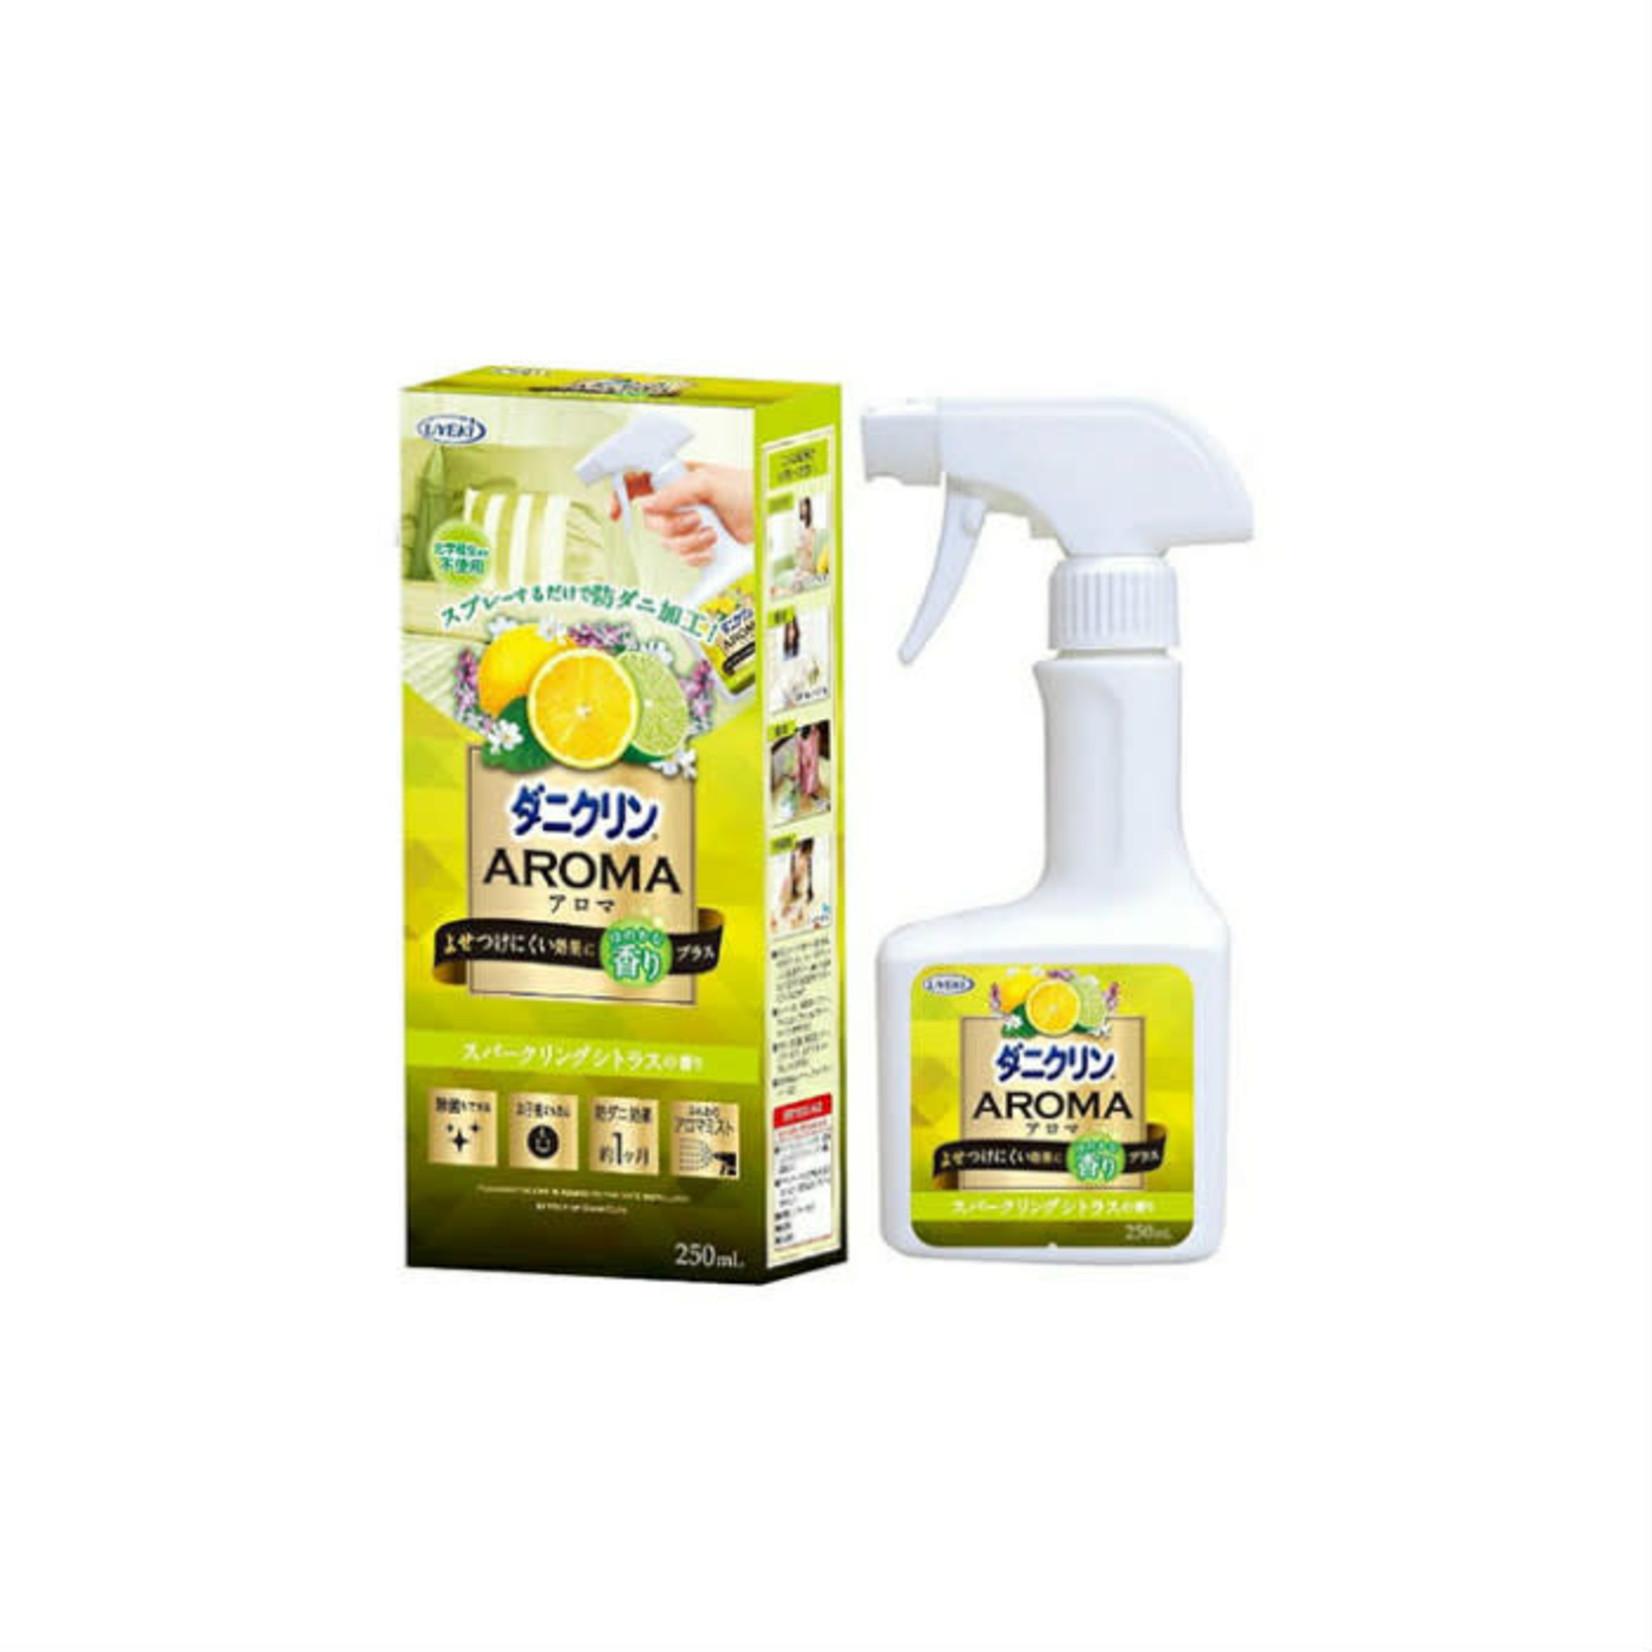 Daniclin Dust Mite Spary - Lemon